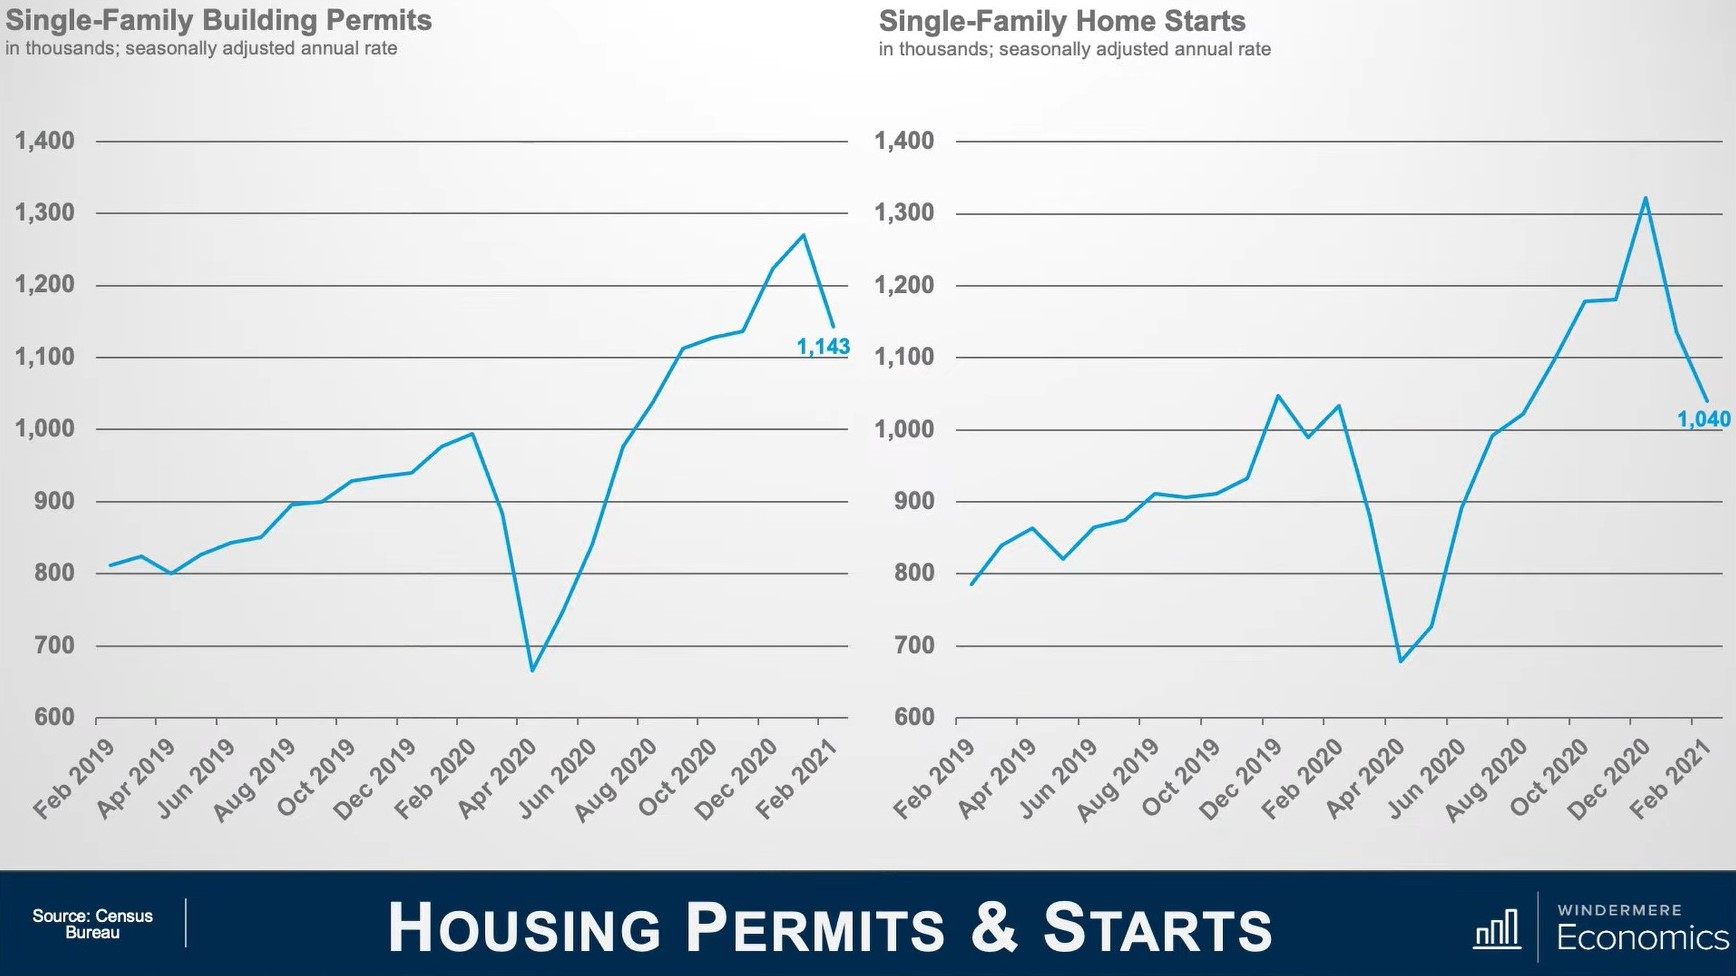 housingpermitsandstarts